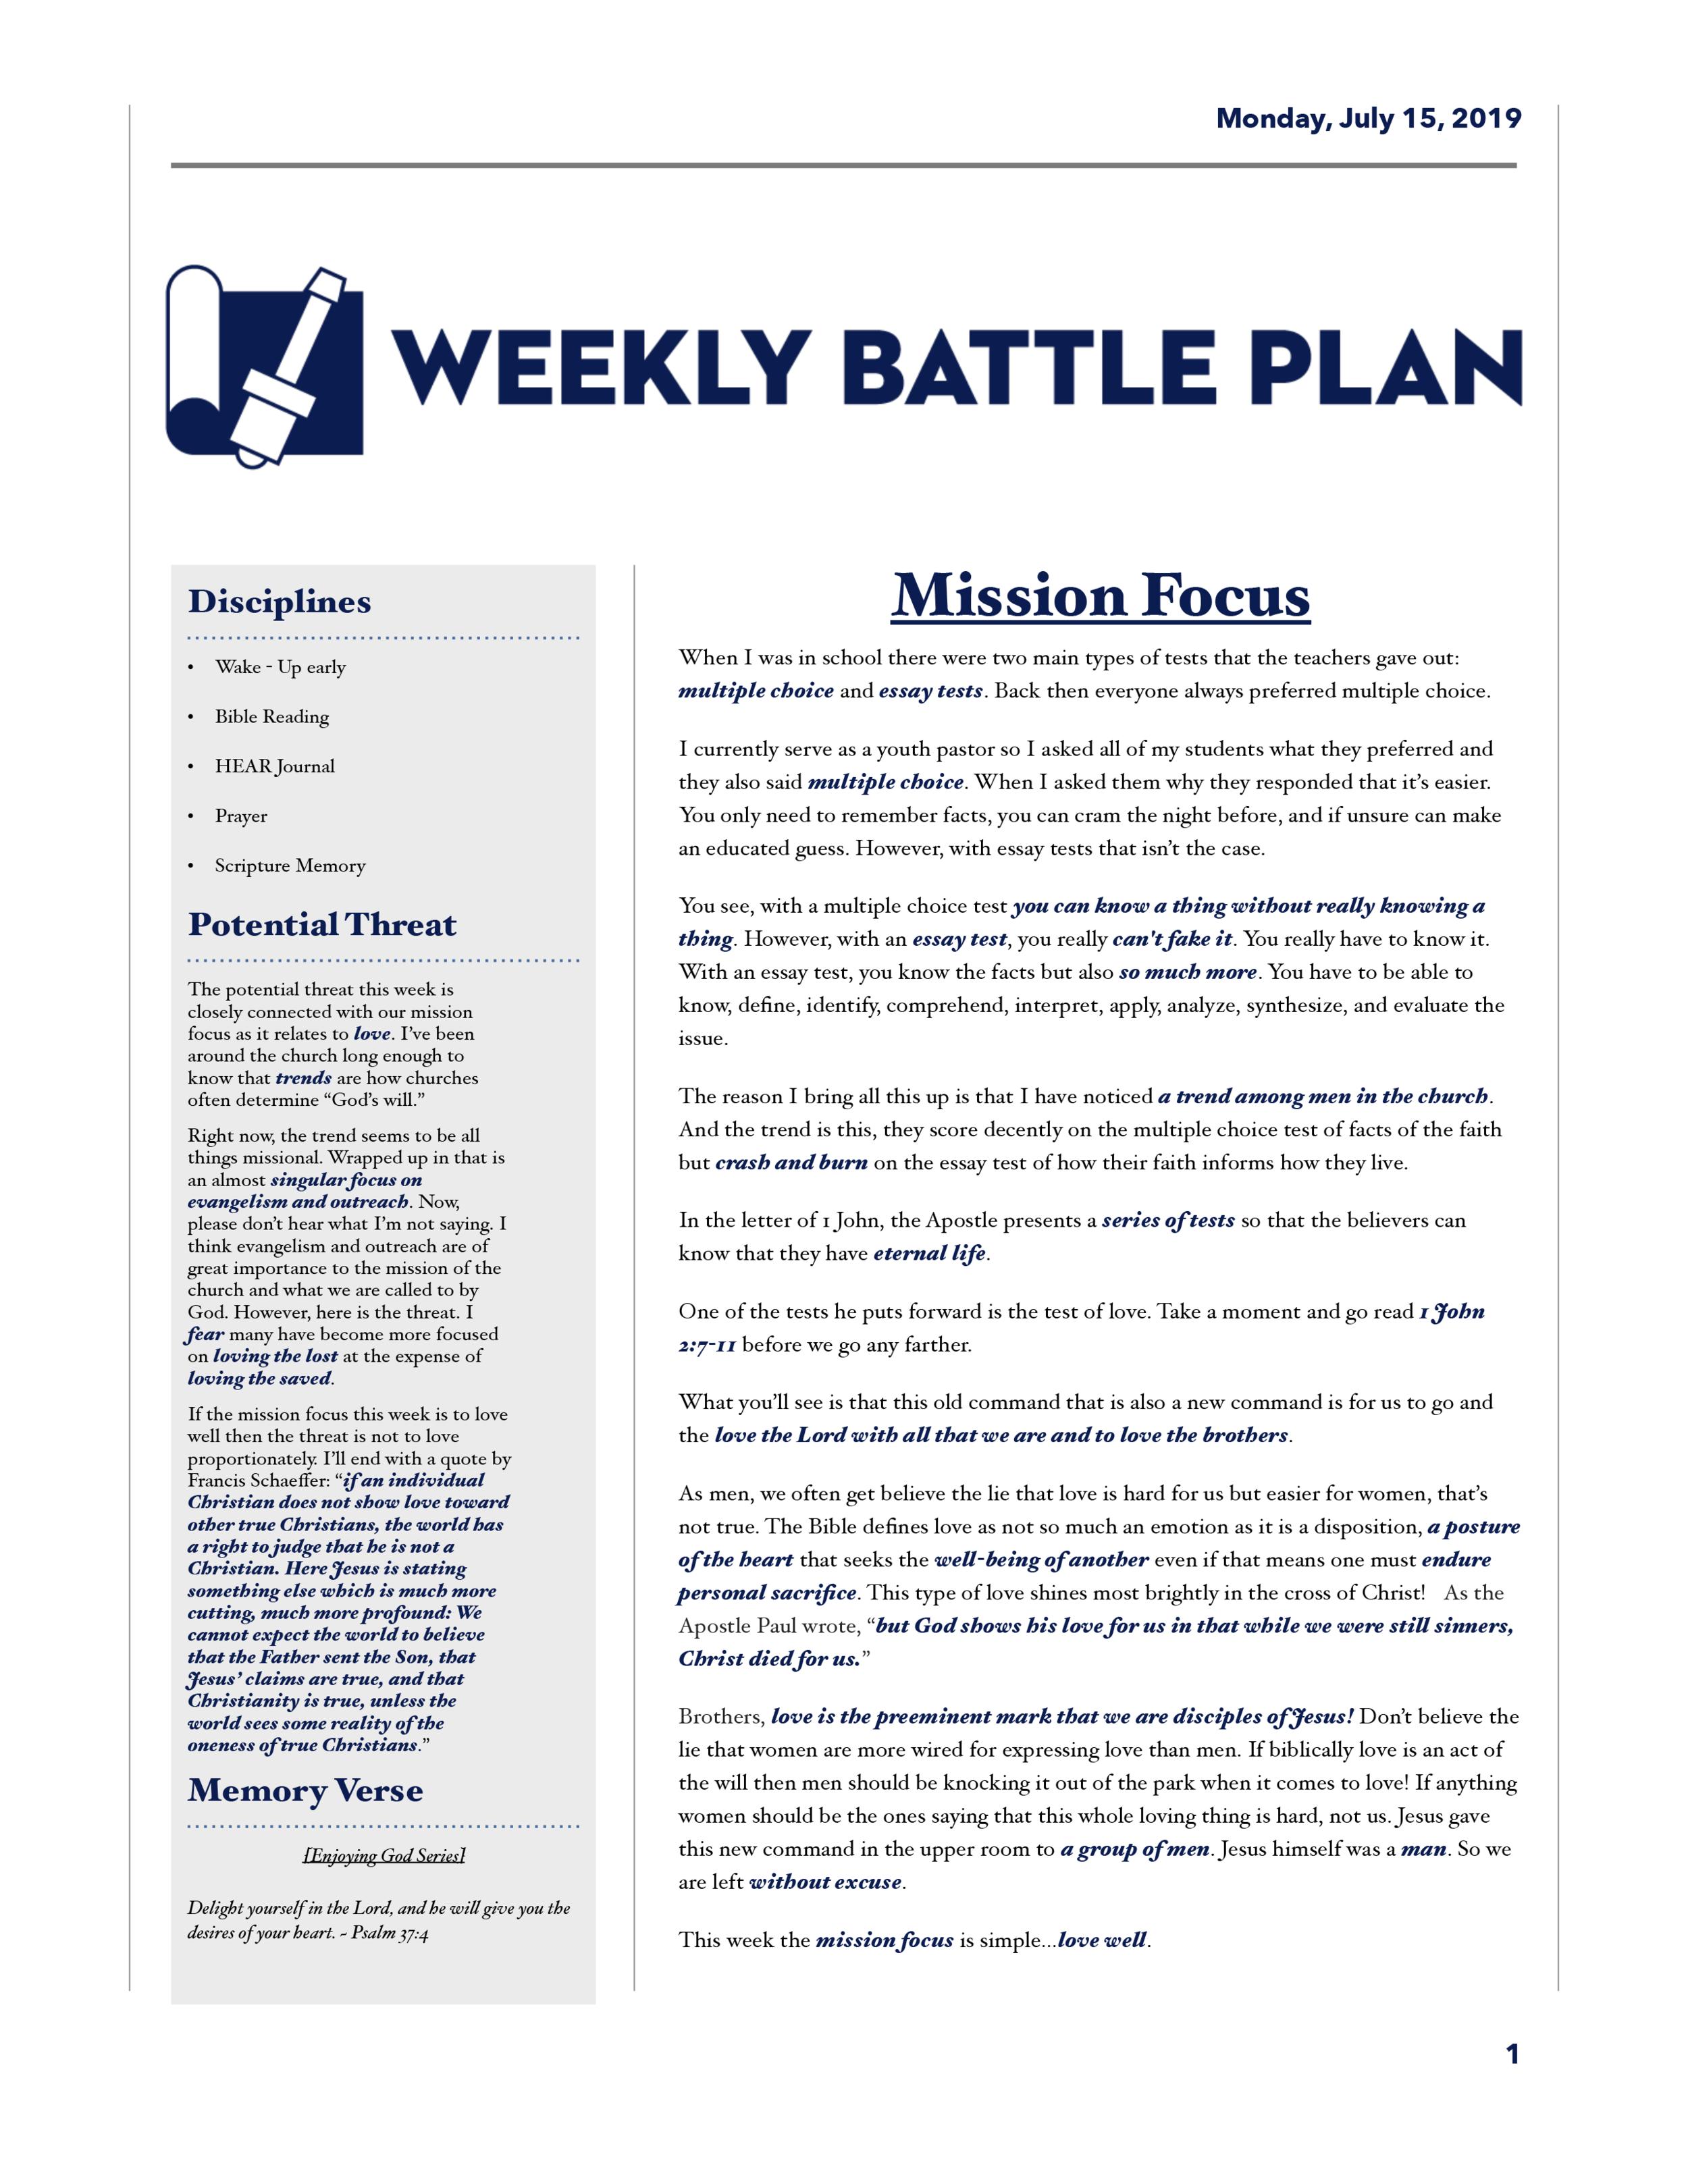 Battle Plan 7.15-1.png